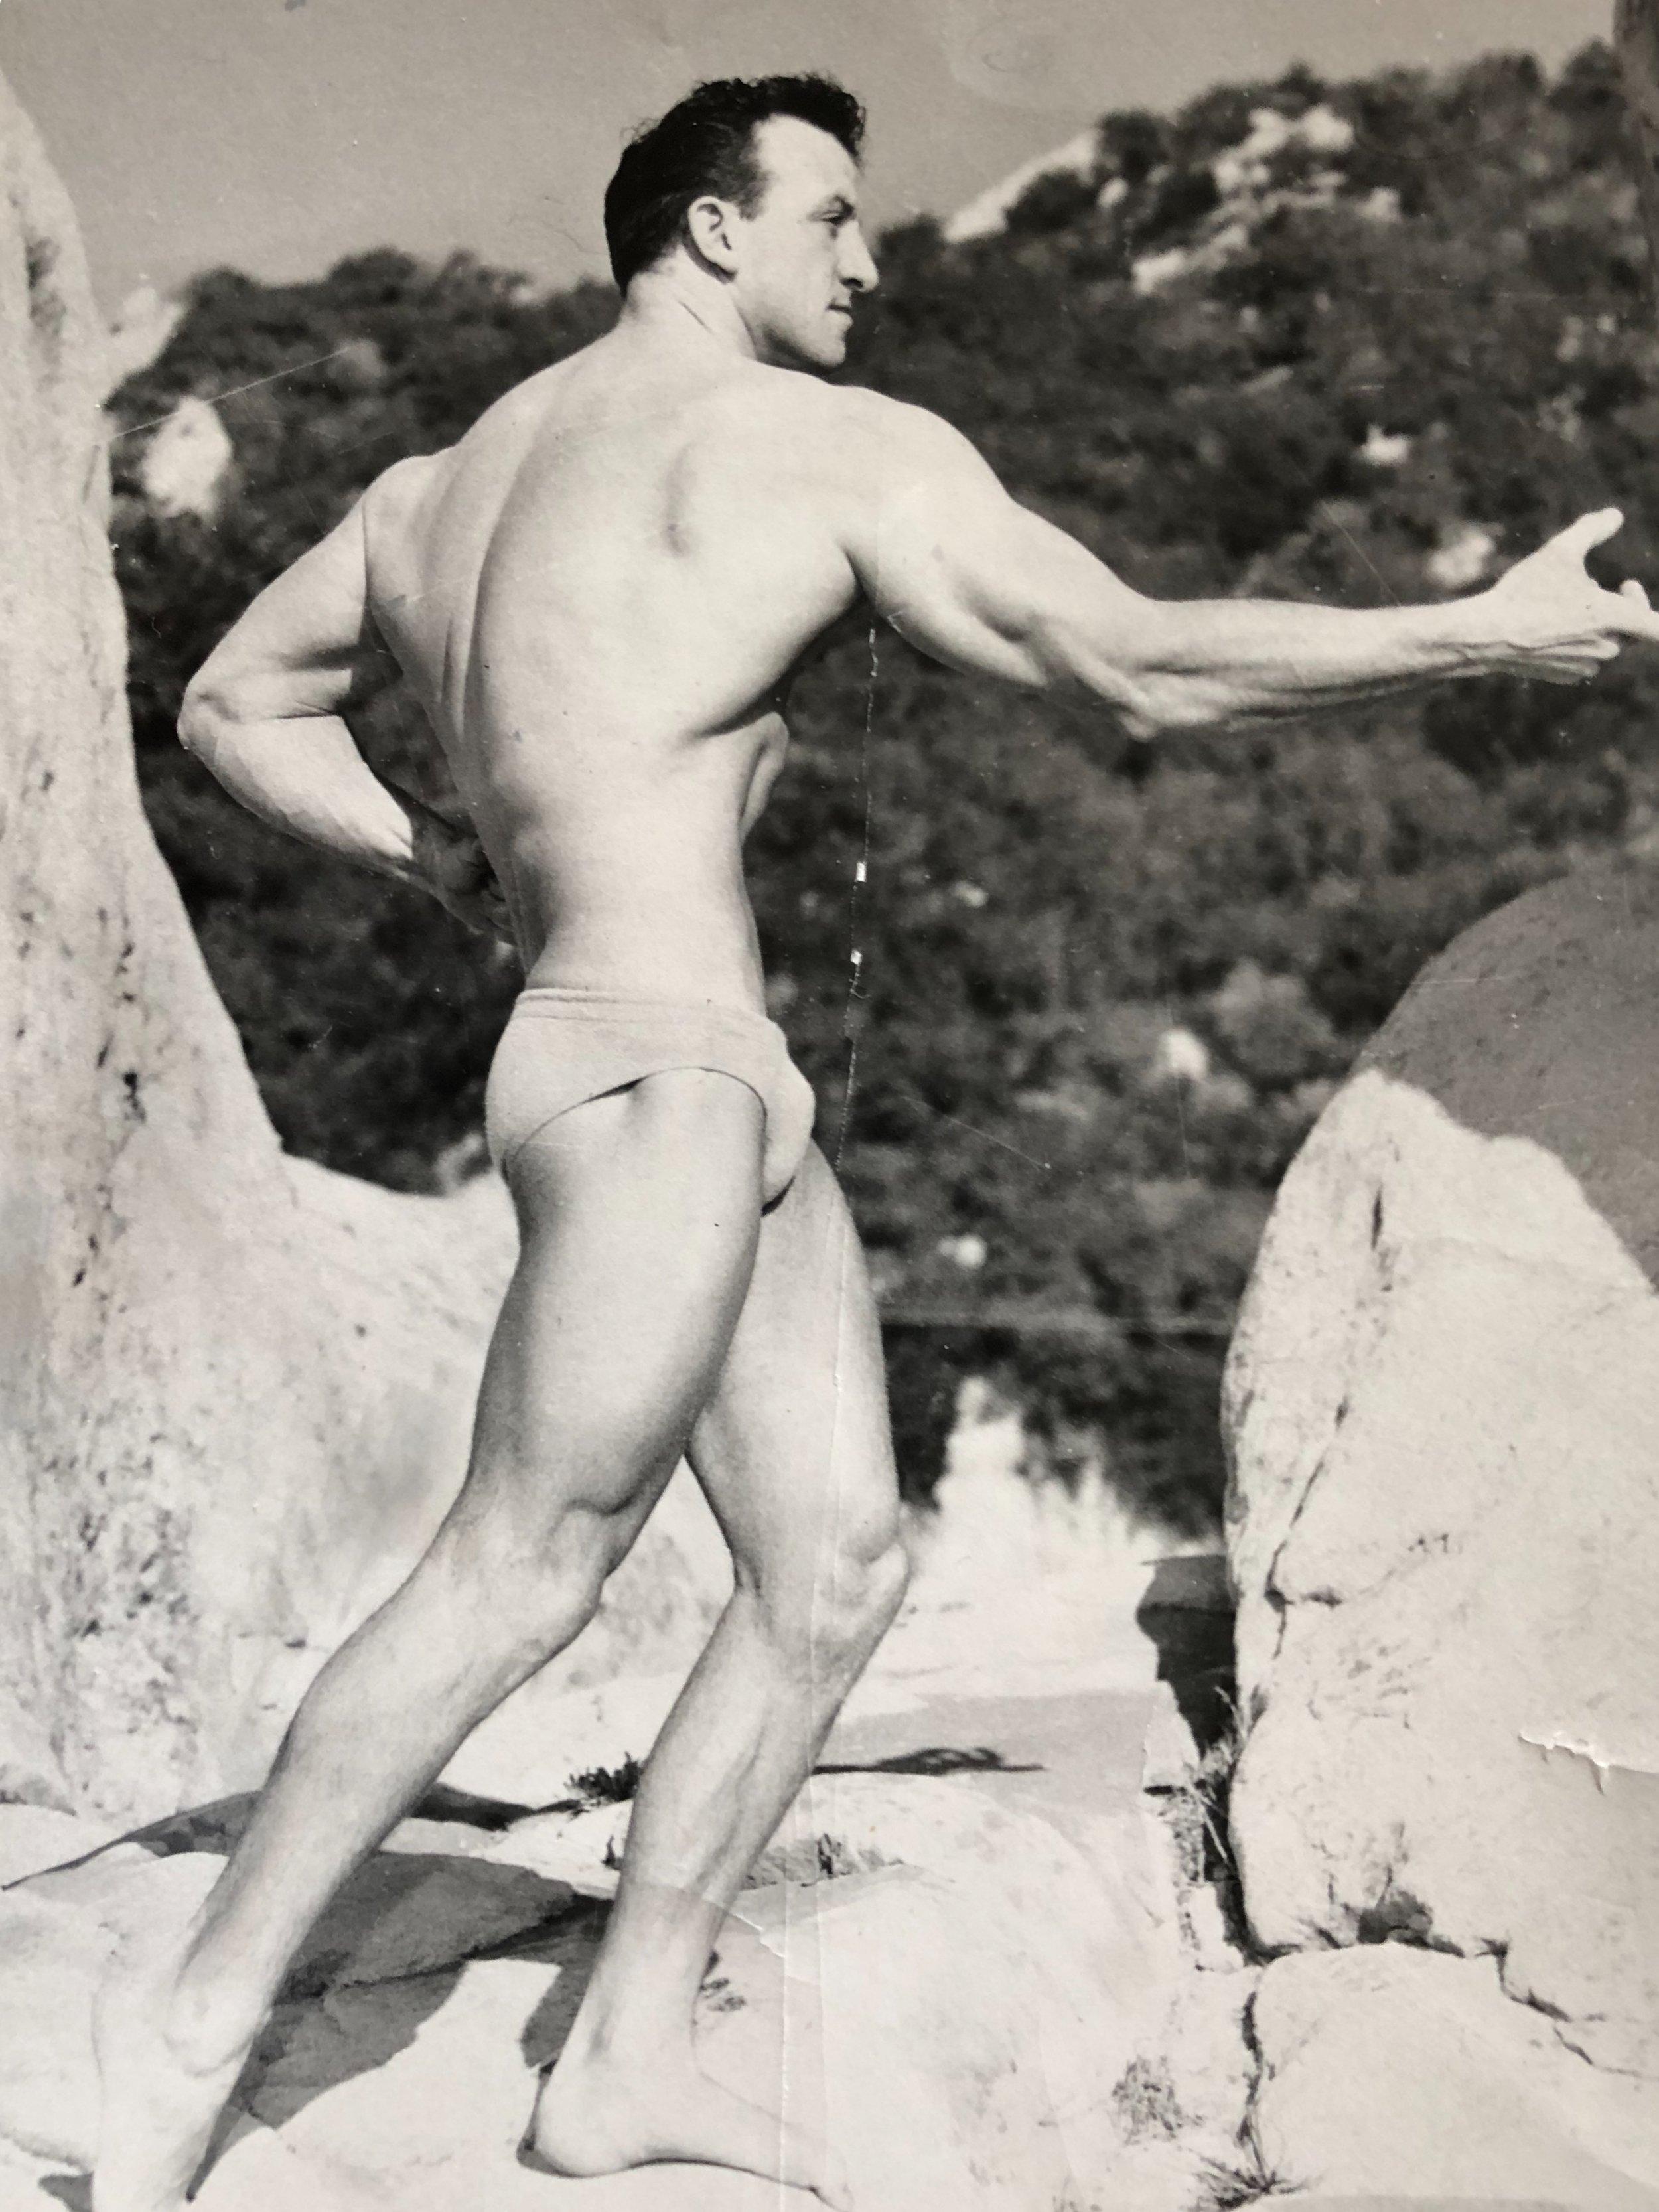 1964 (MUSCLE ROCK) - AGOURA